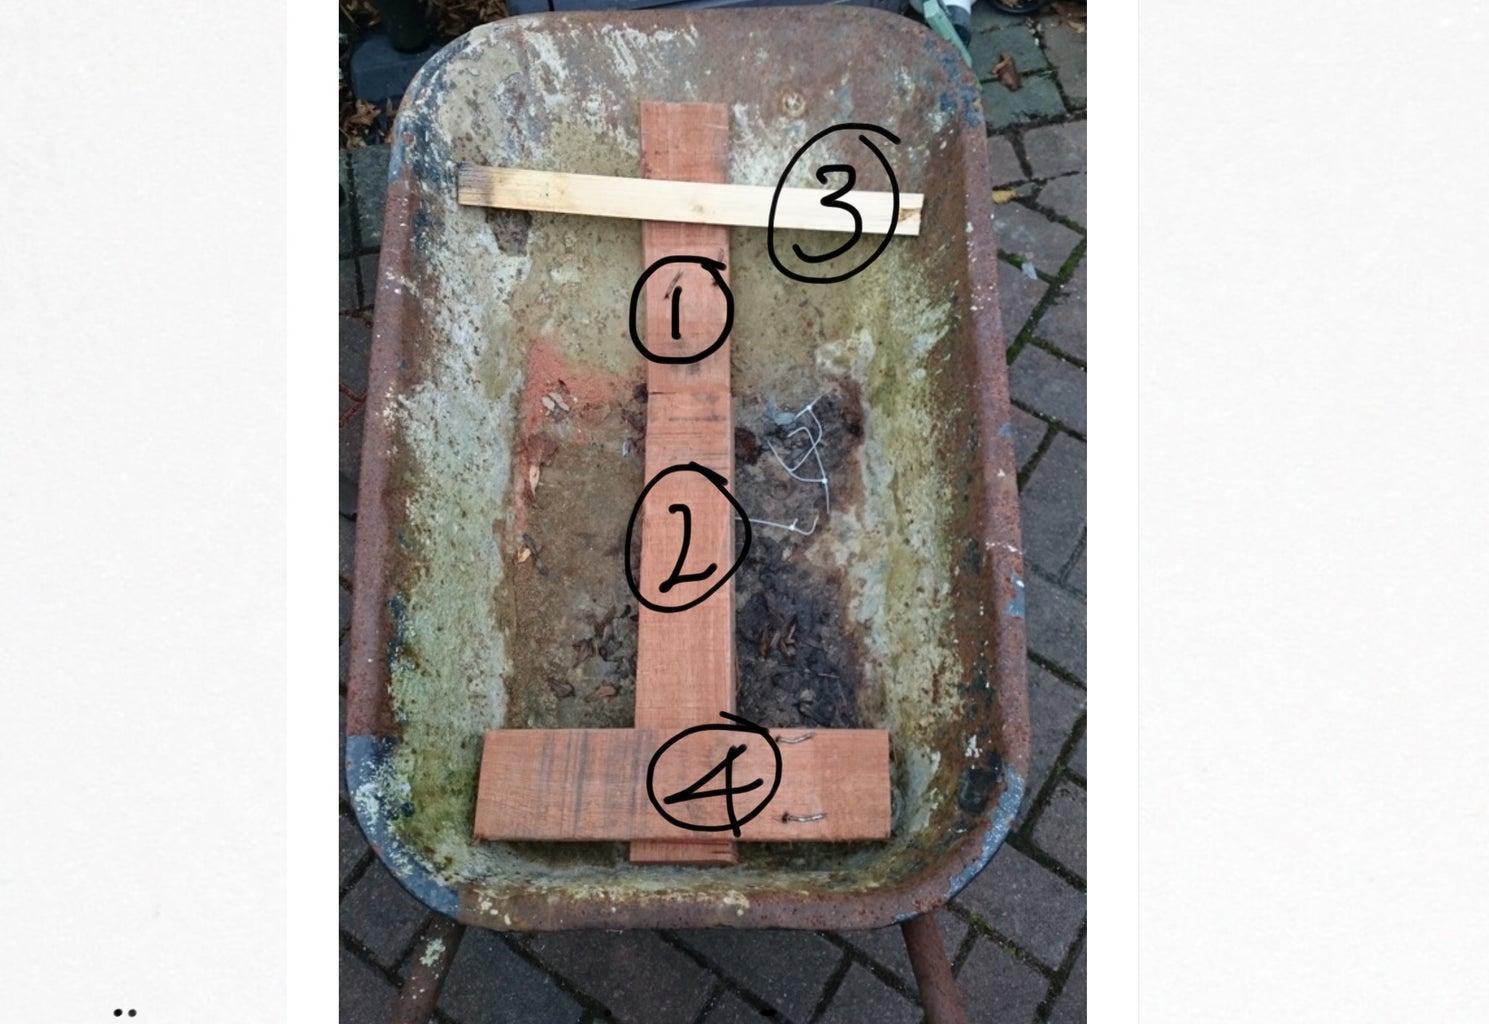 Cut Wood to Fit Wheelbarrow